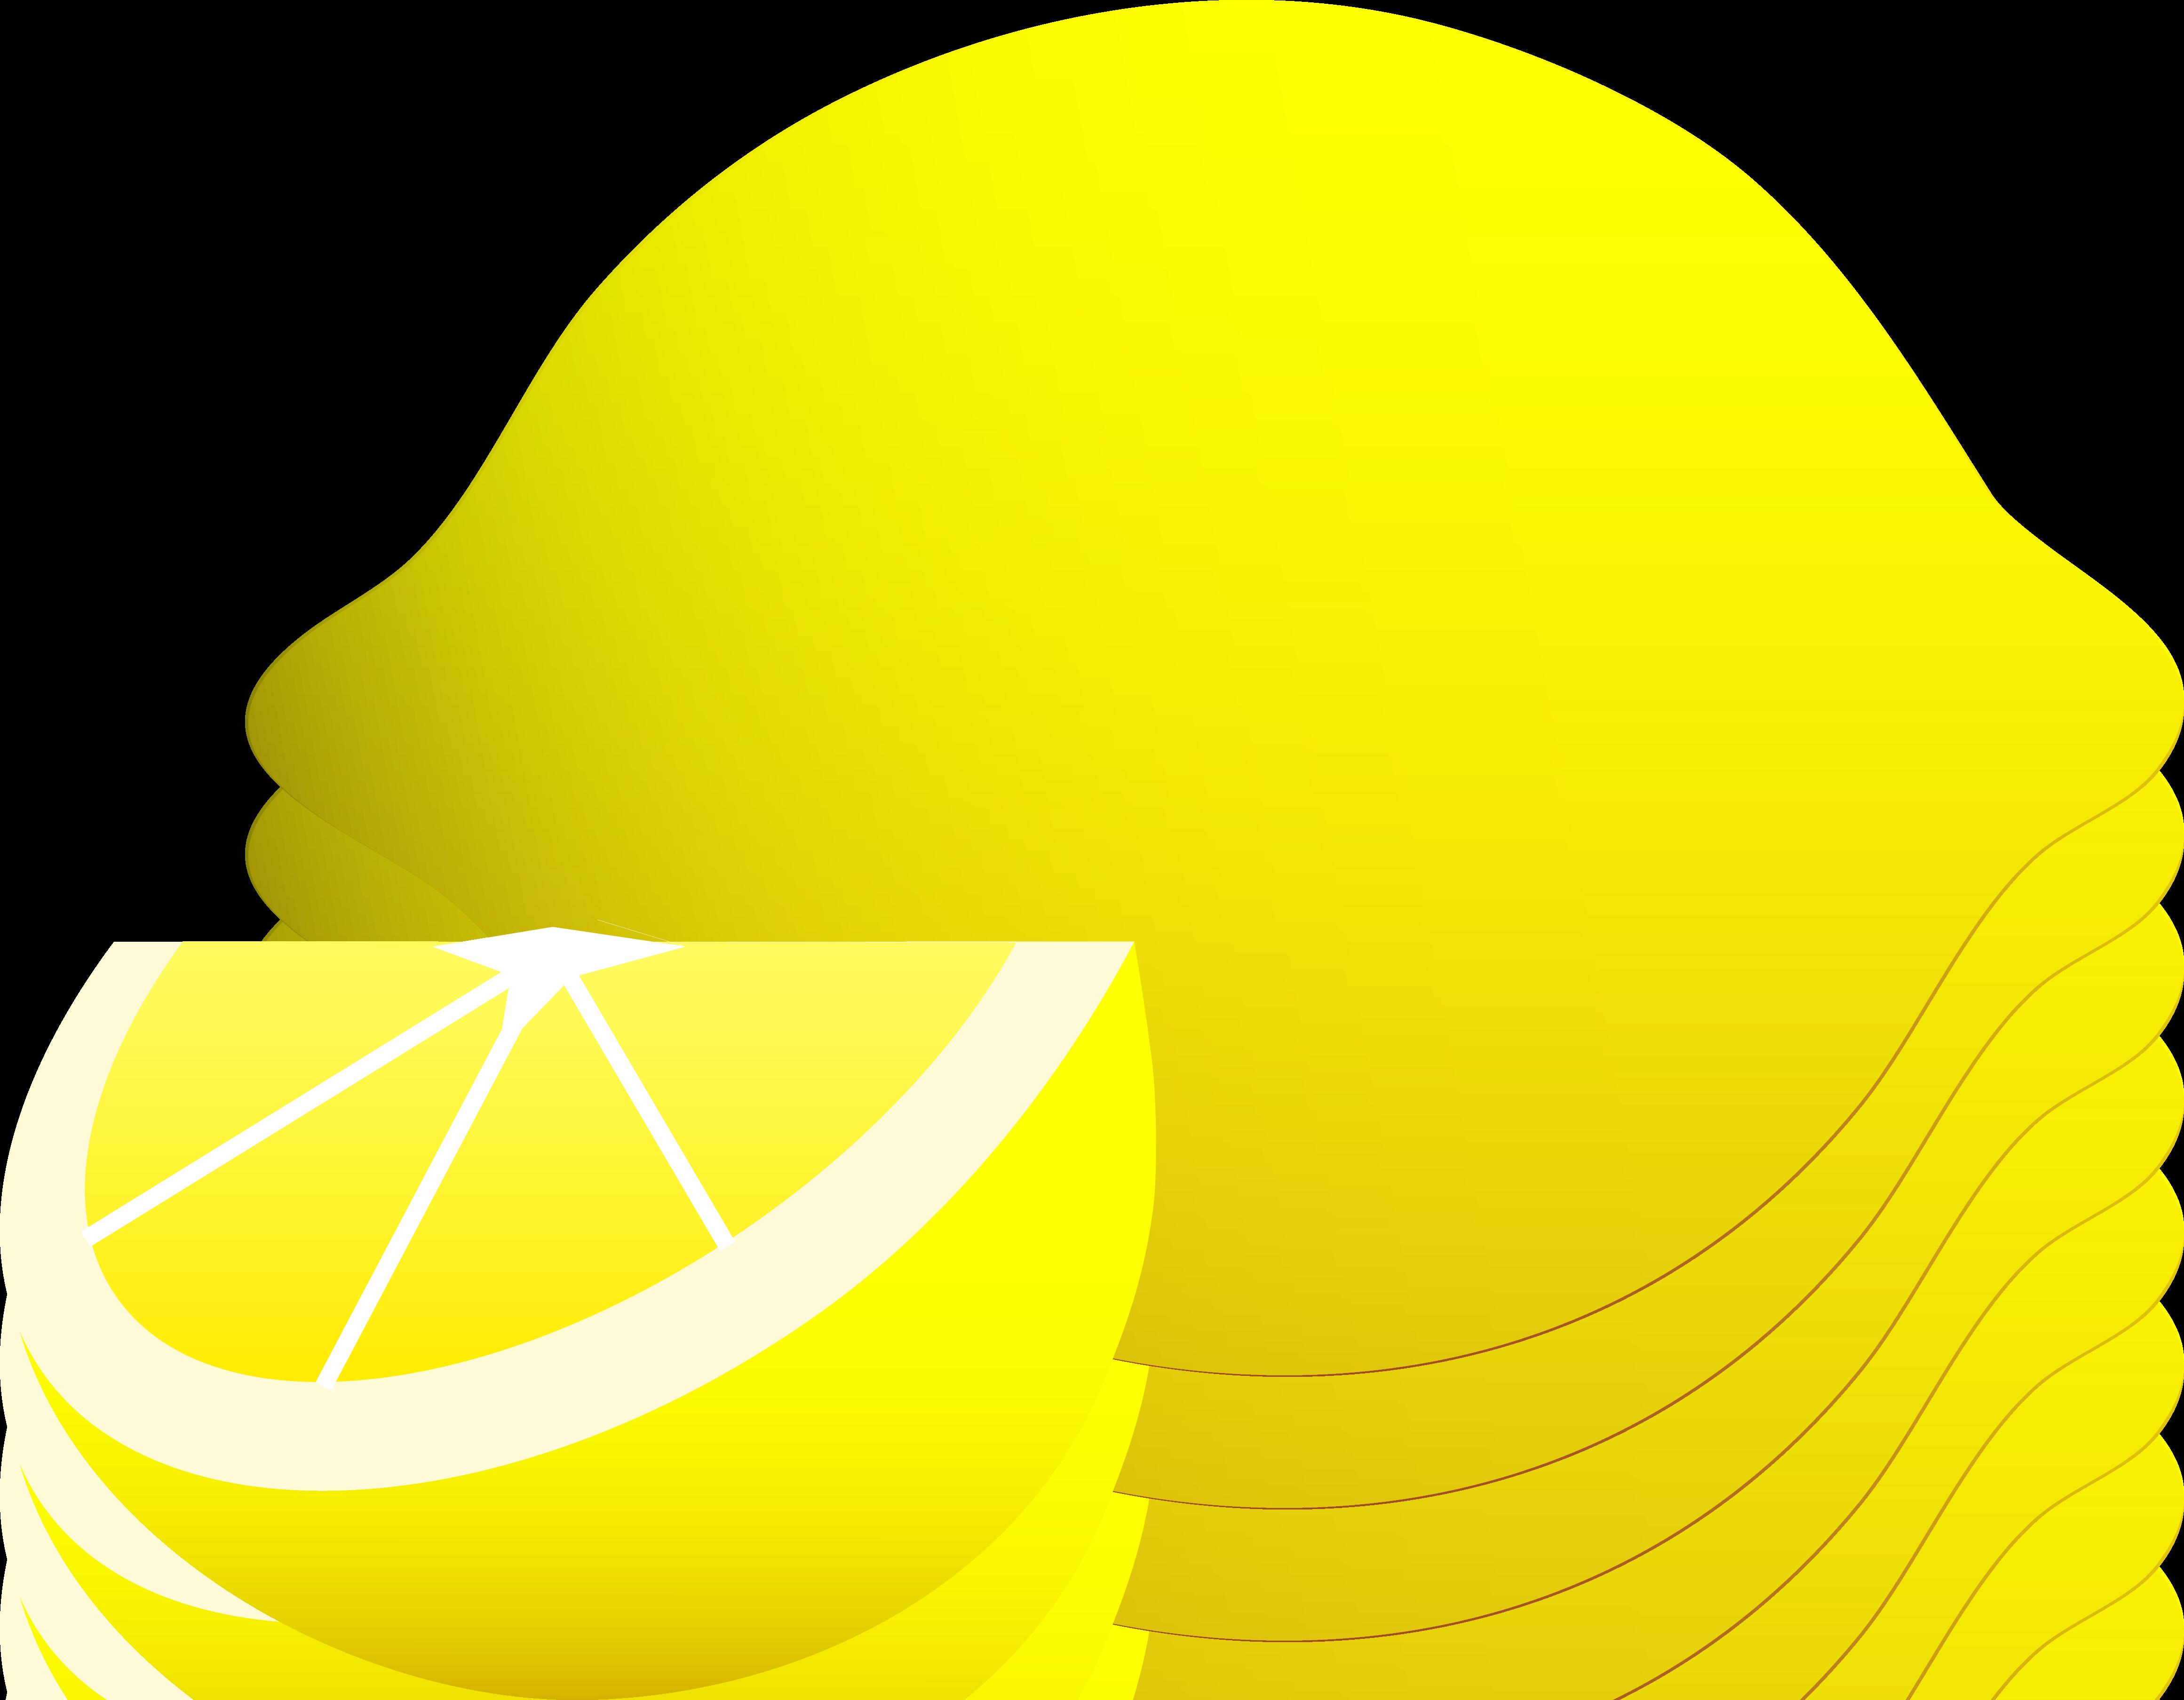 Whole Lemon With Wedge.